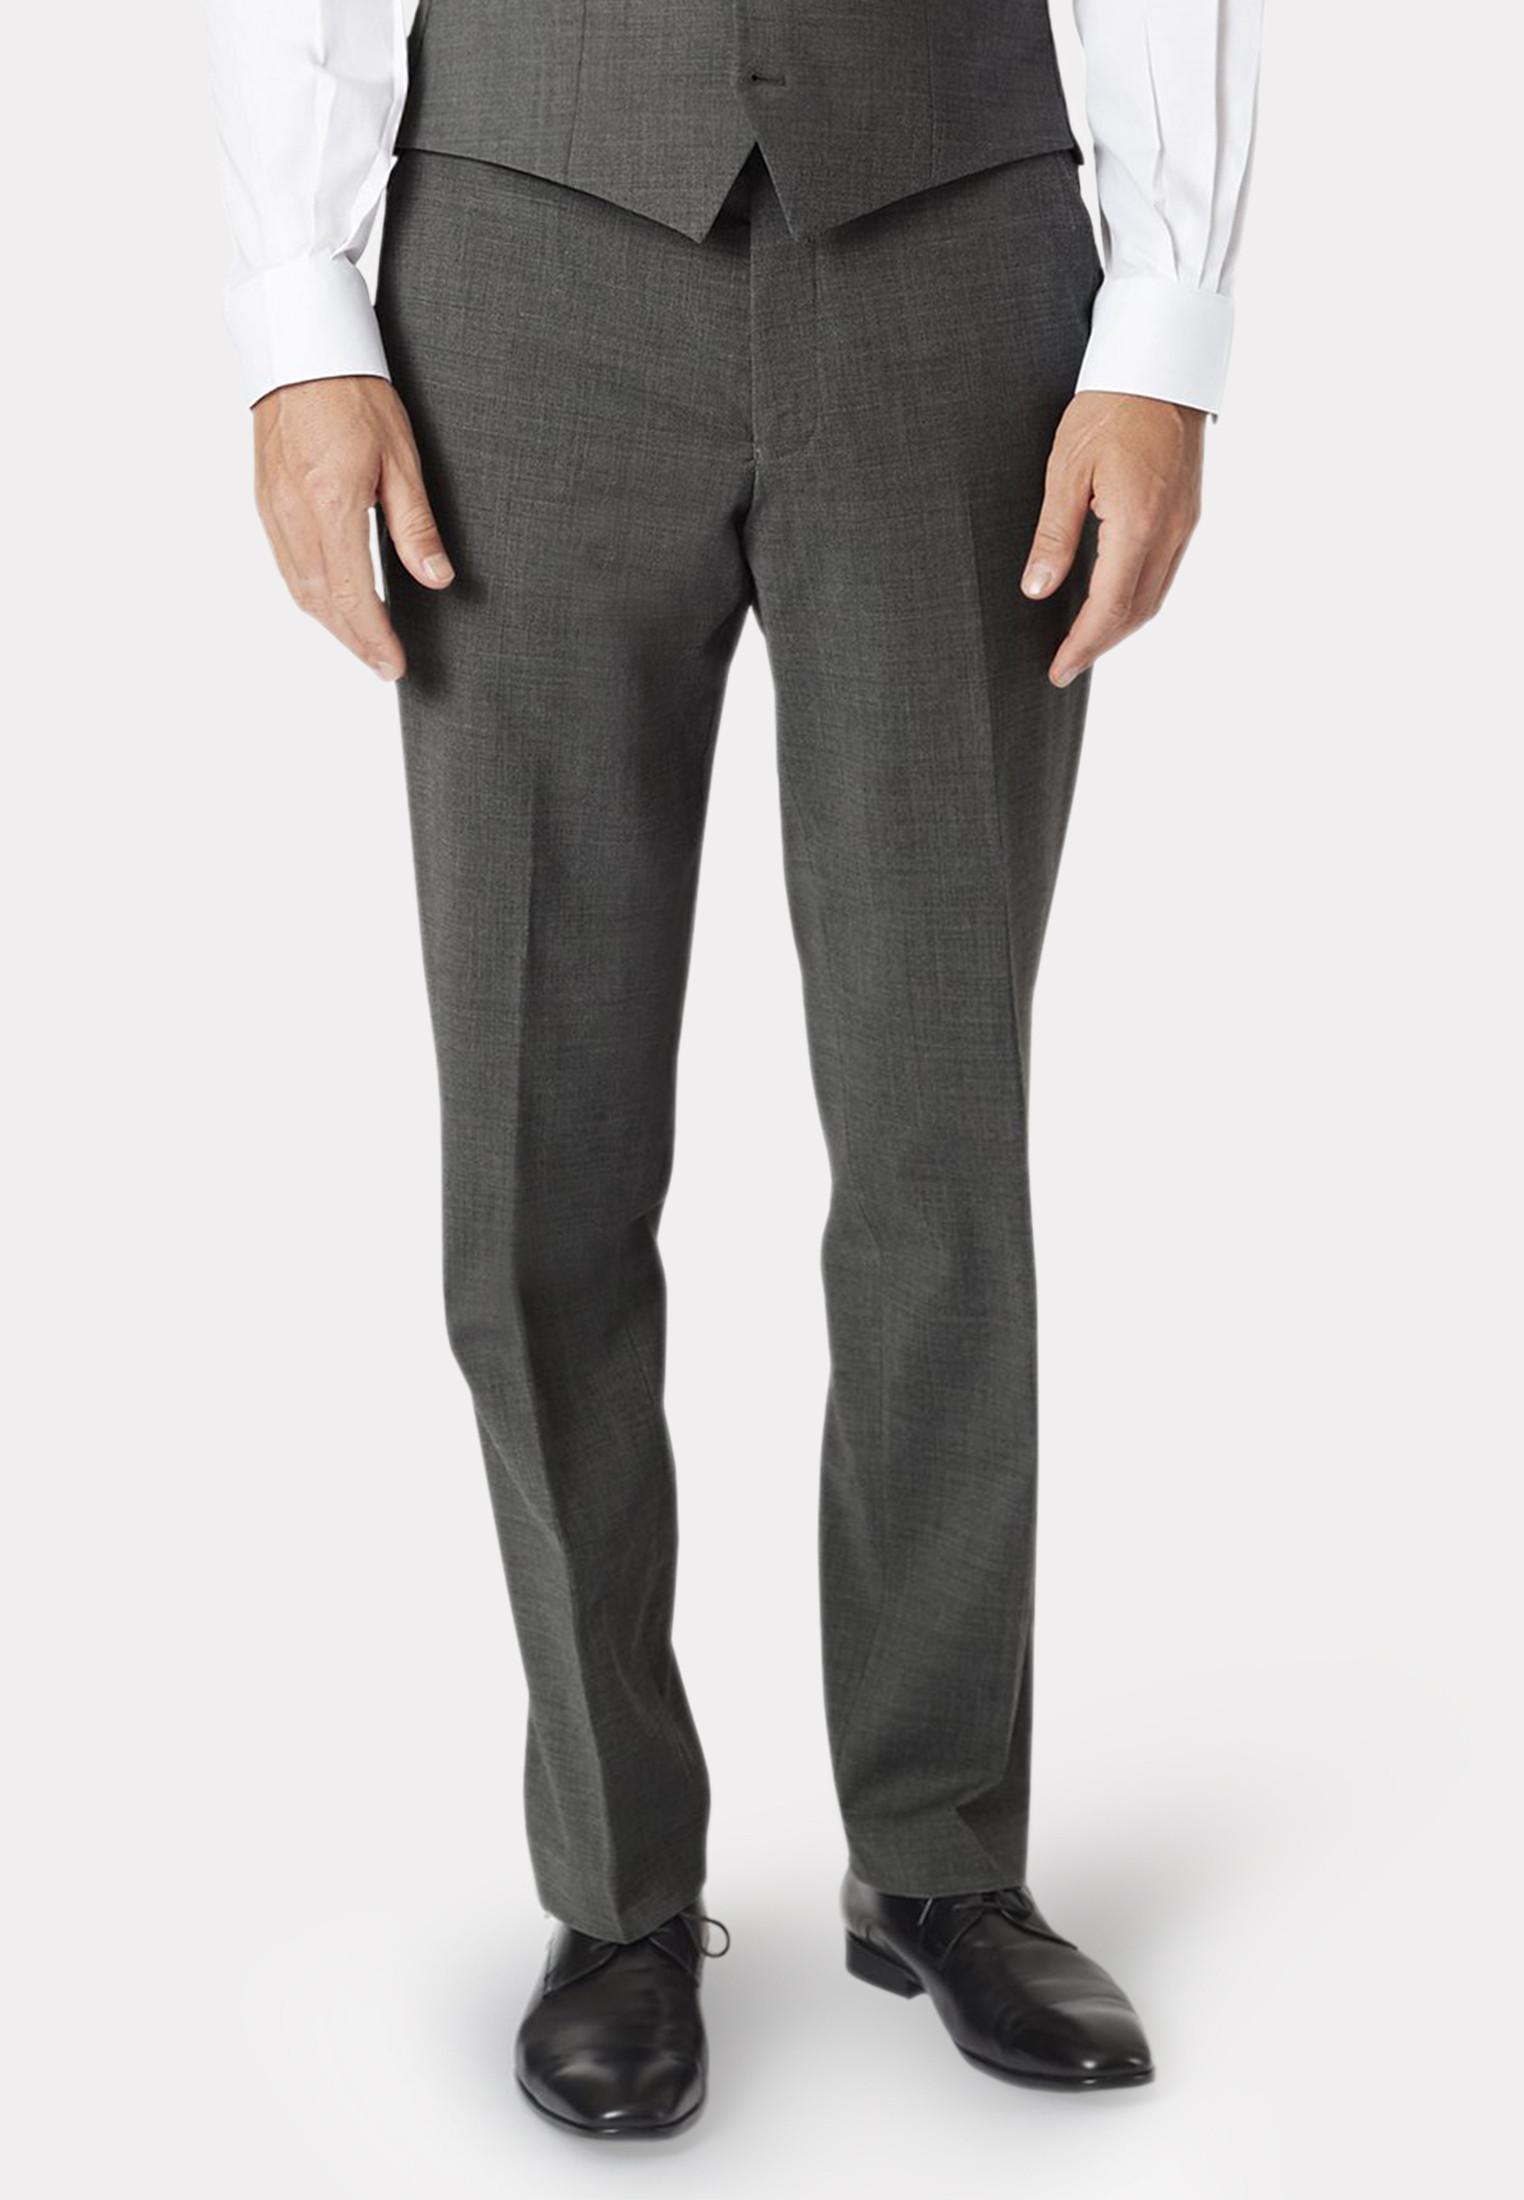 Avalino Grey Three Piece Travel Suit  - Waistcoat Optional